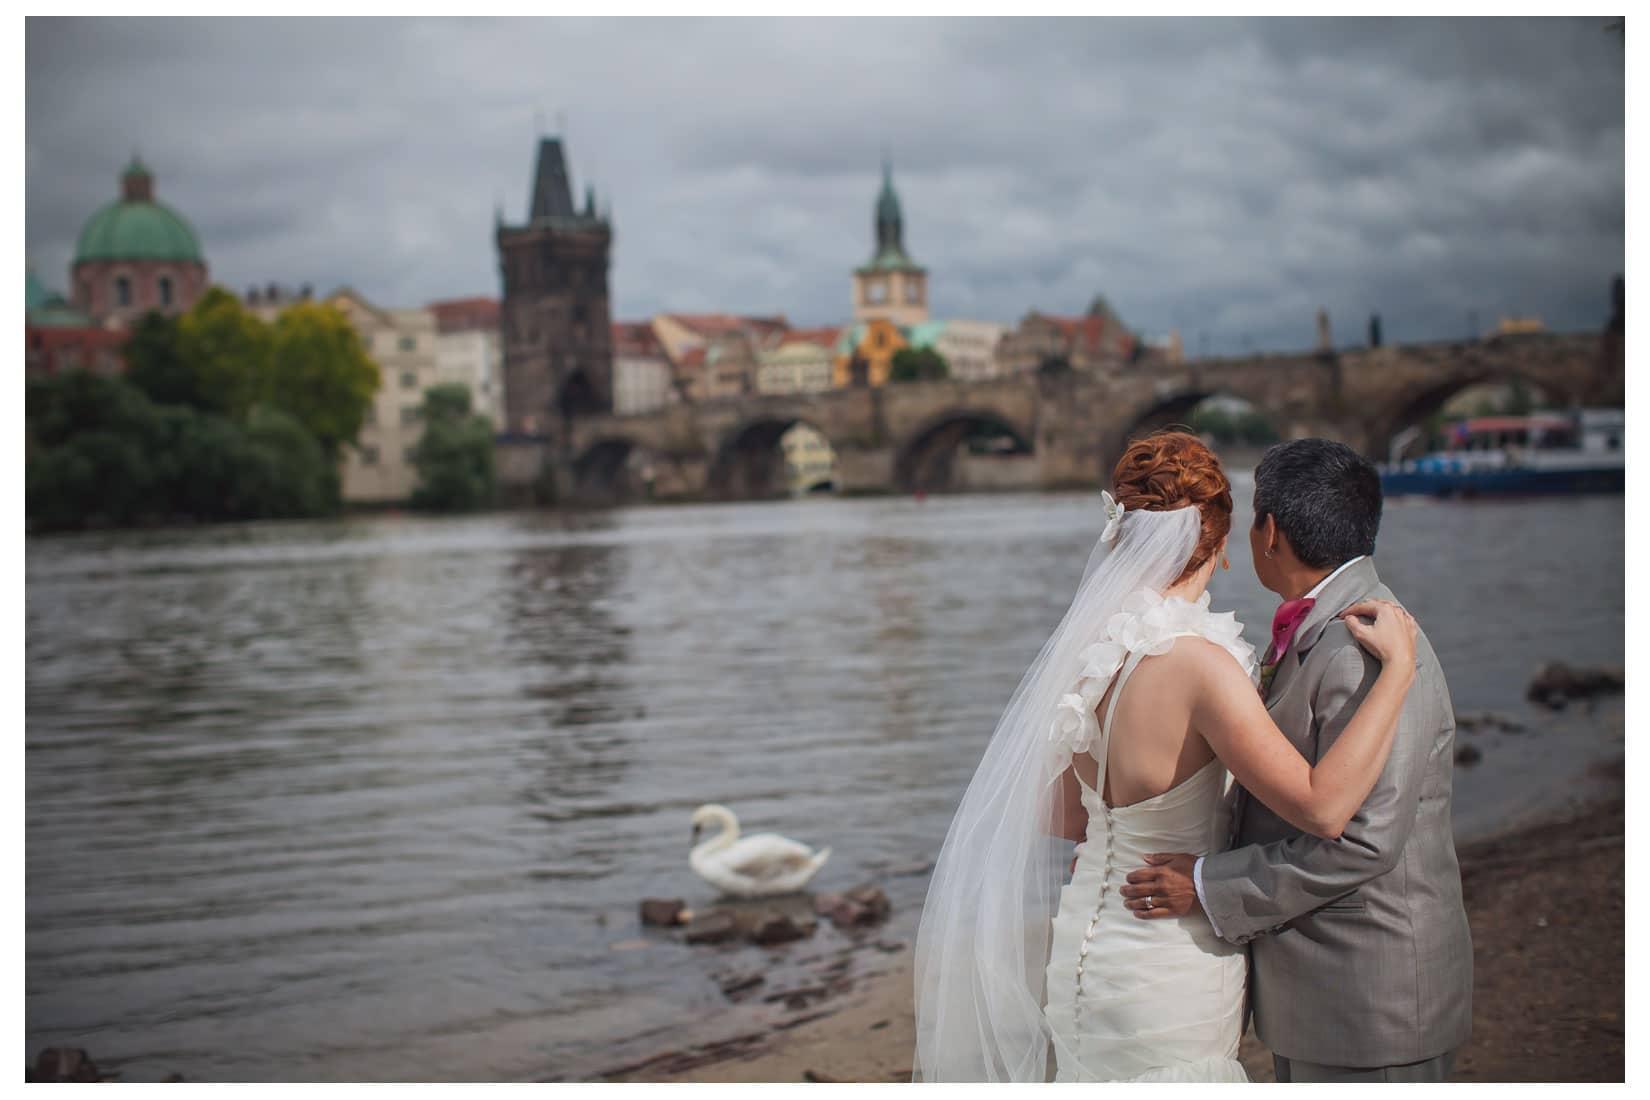 Charles Bridge Wedding / Kimberly & Jules / Na Plavka wedding portraits near the Charles Bridge